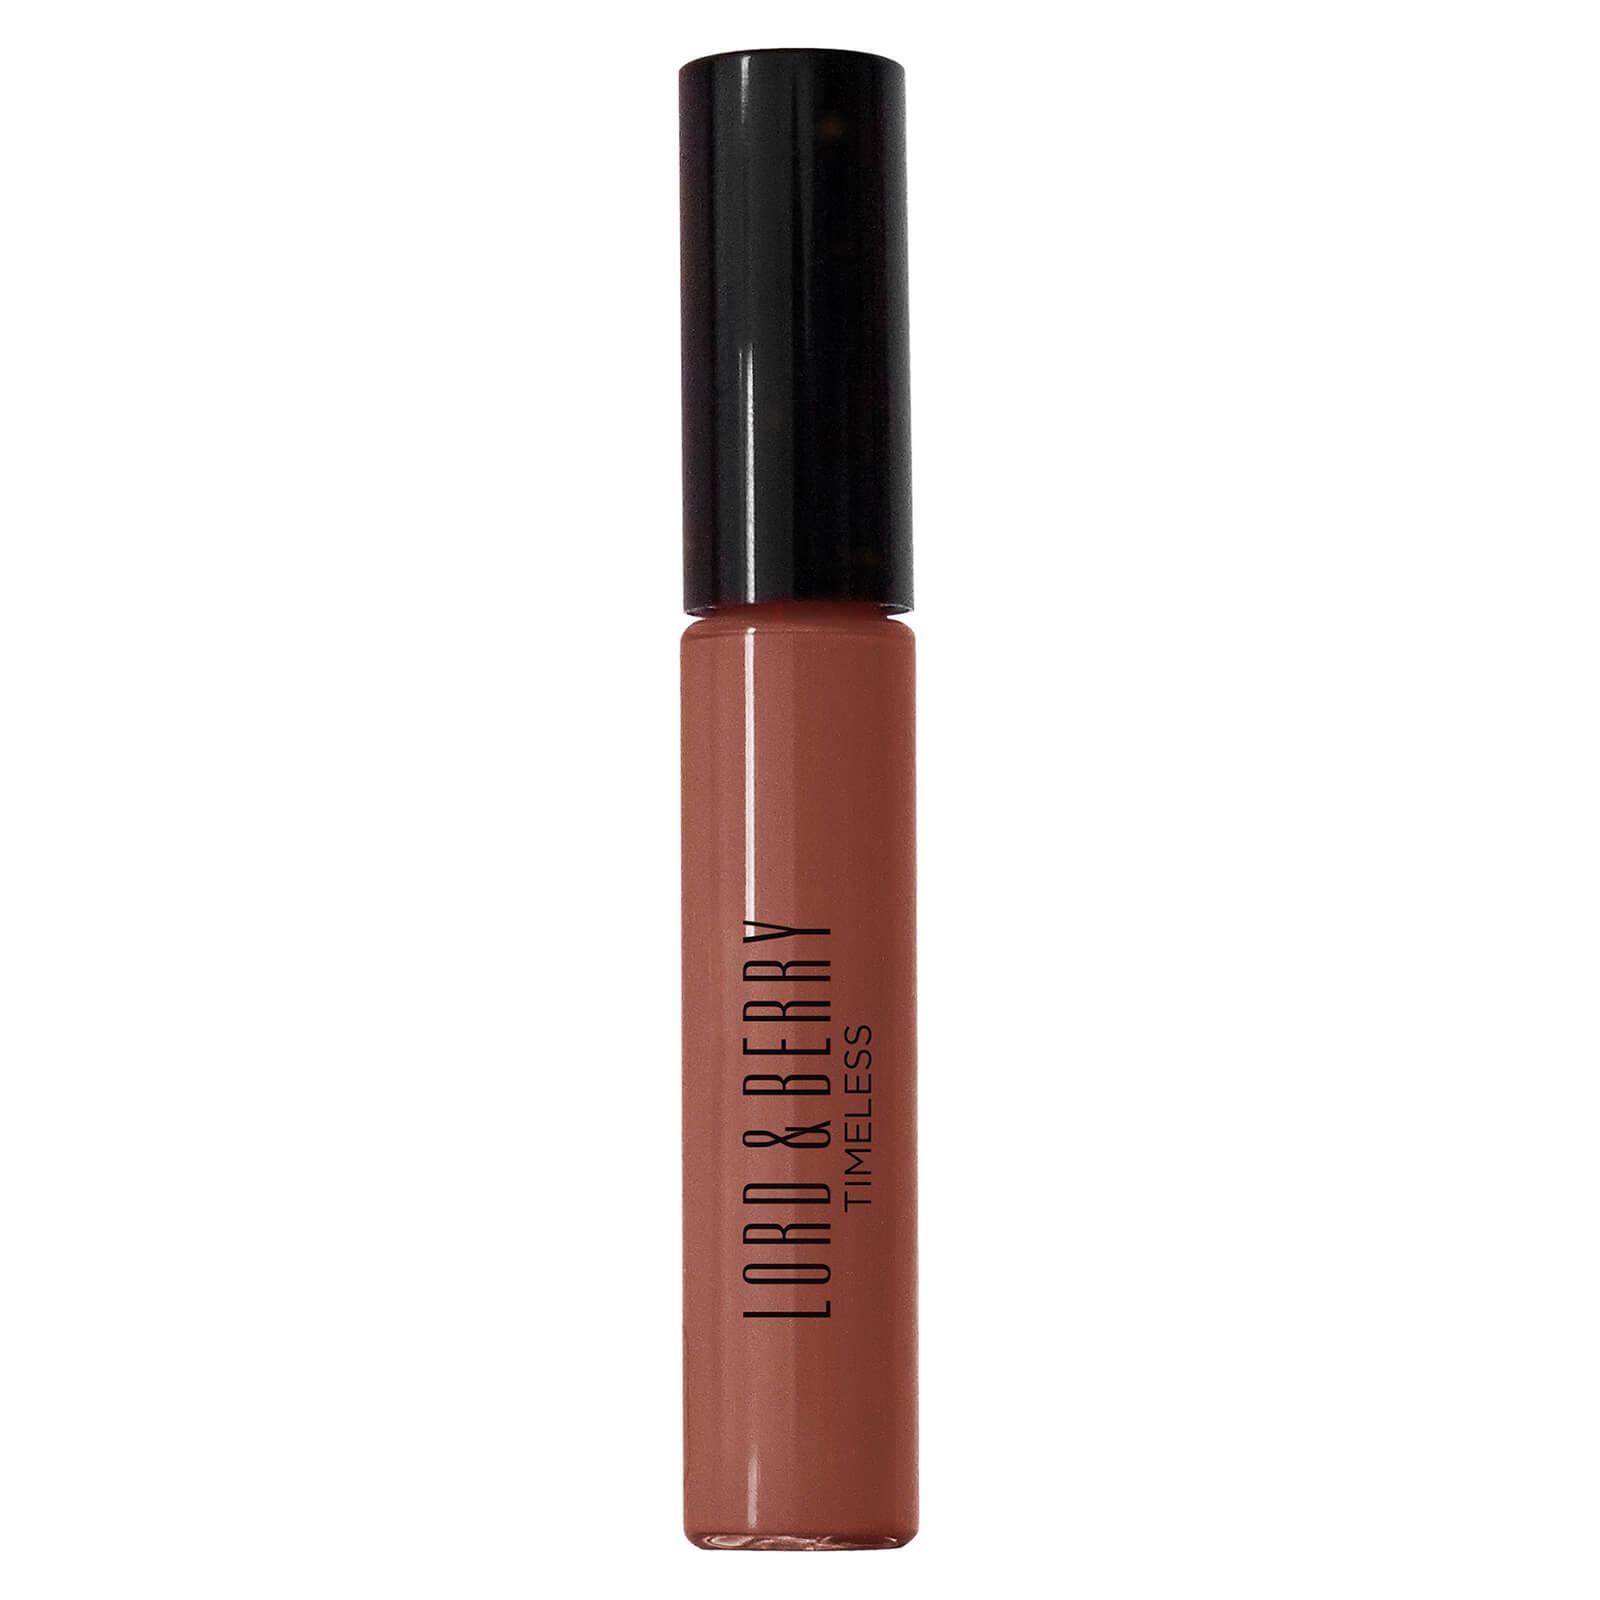 Купить Lord & Berry Timeless Kissproof Lipstick Помада для губ - Noblesse